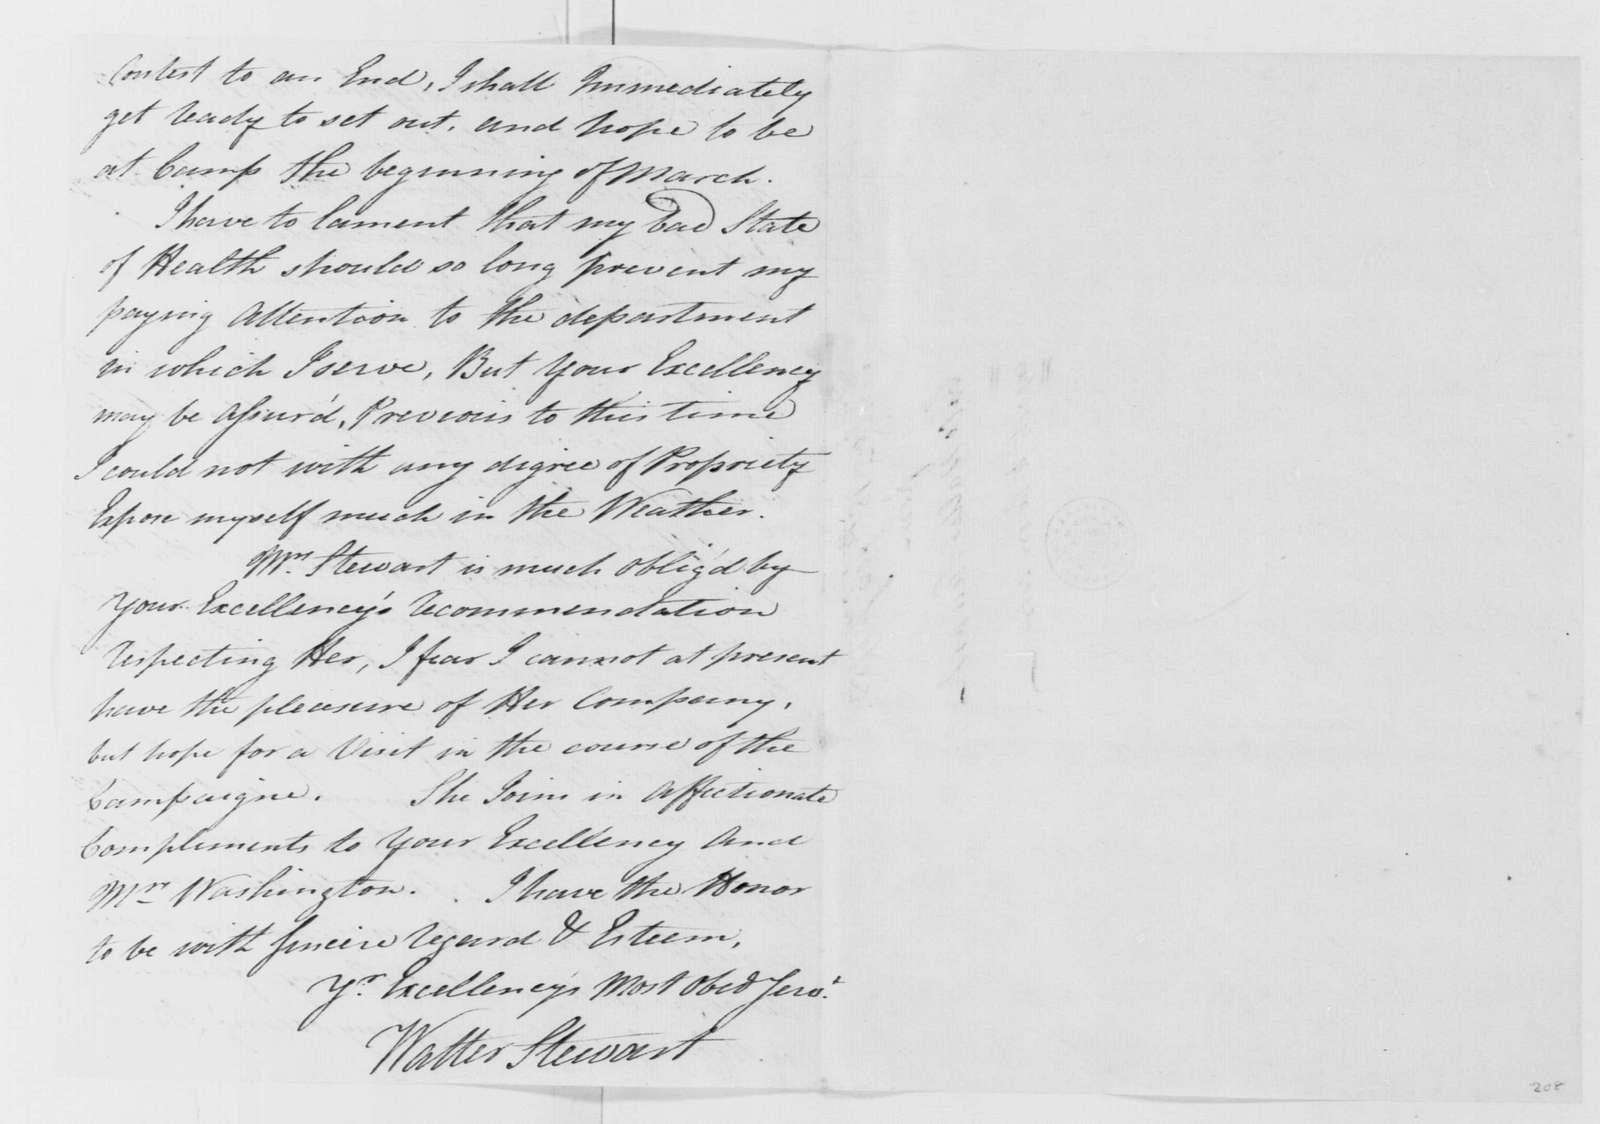 George Washington Papers, Series 4, General Correspondence: Walter Stewart to George Washington, February 18, 1783